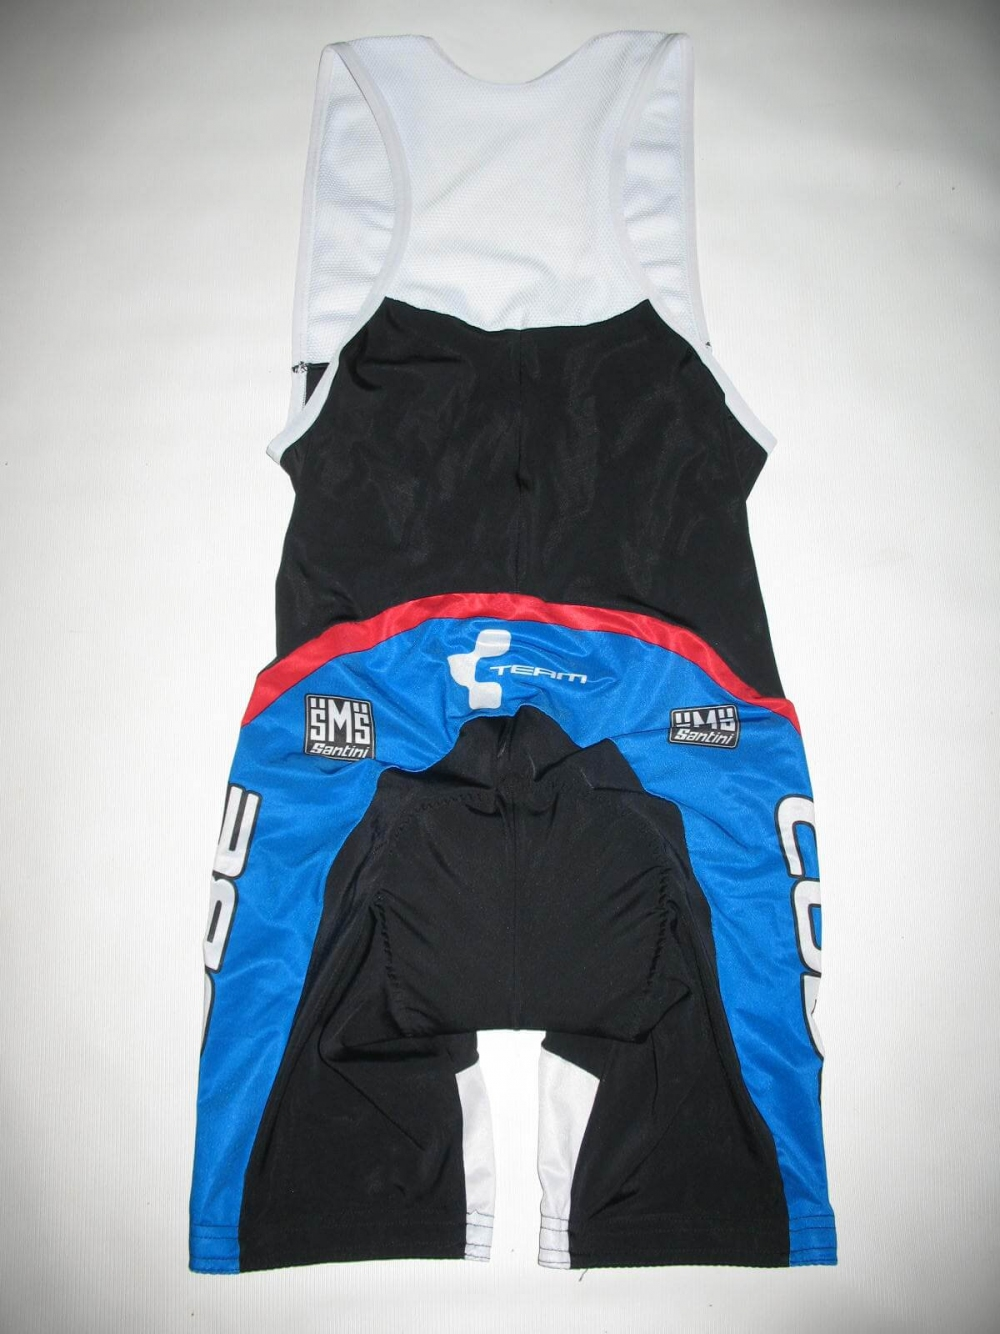 Велошорты SMS SANTINI cube bib shorts (размер 44-46/M-S) - 1